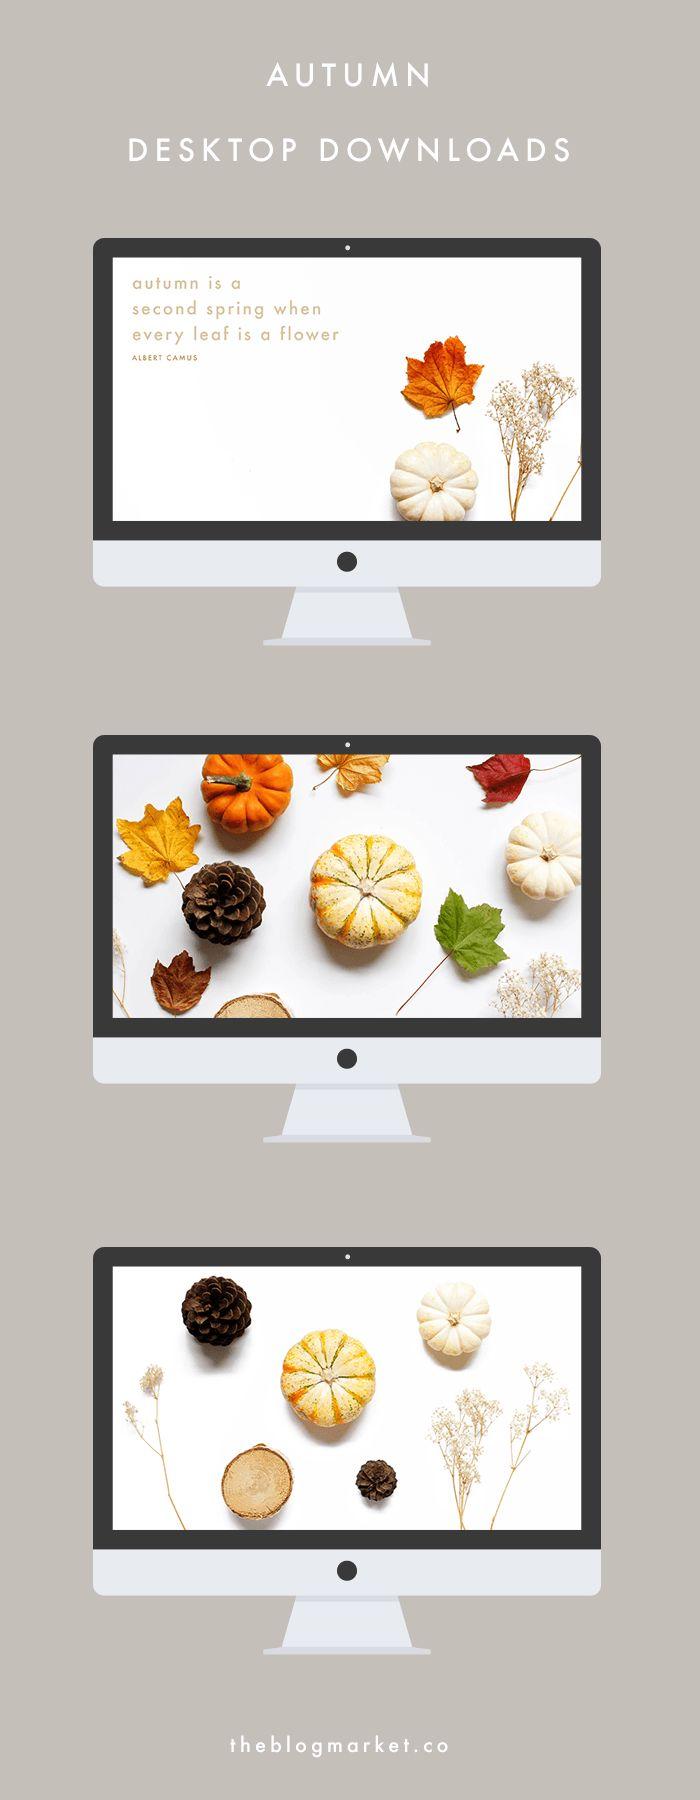 3 Autumn Desktop Downloads - The Blog Market